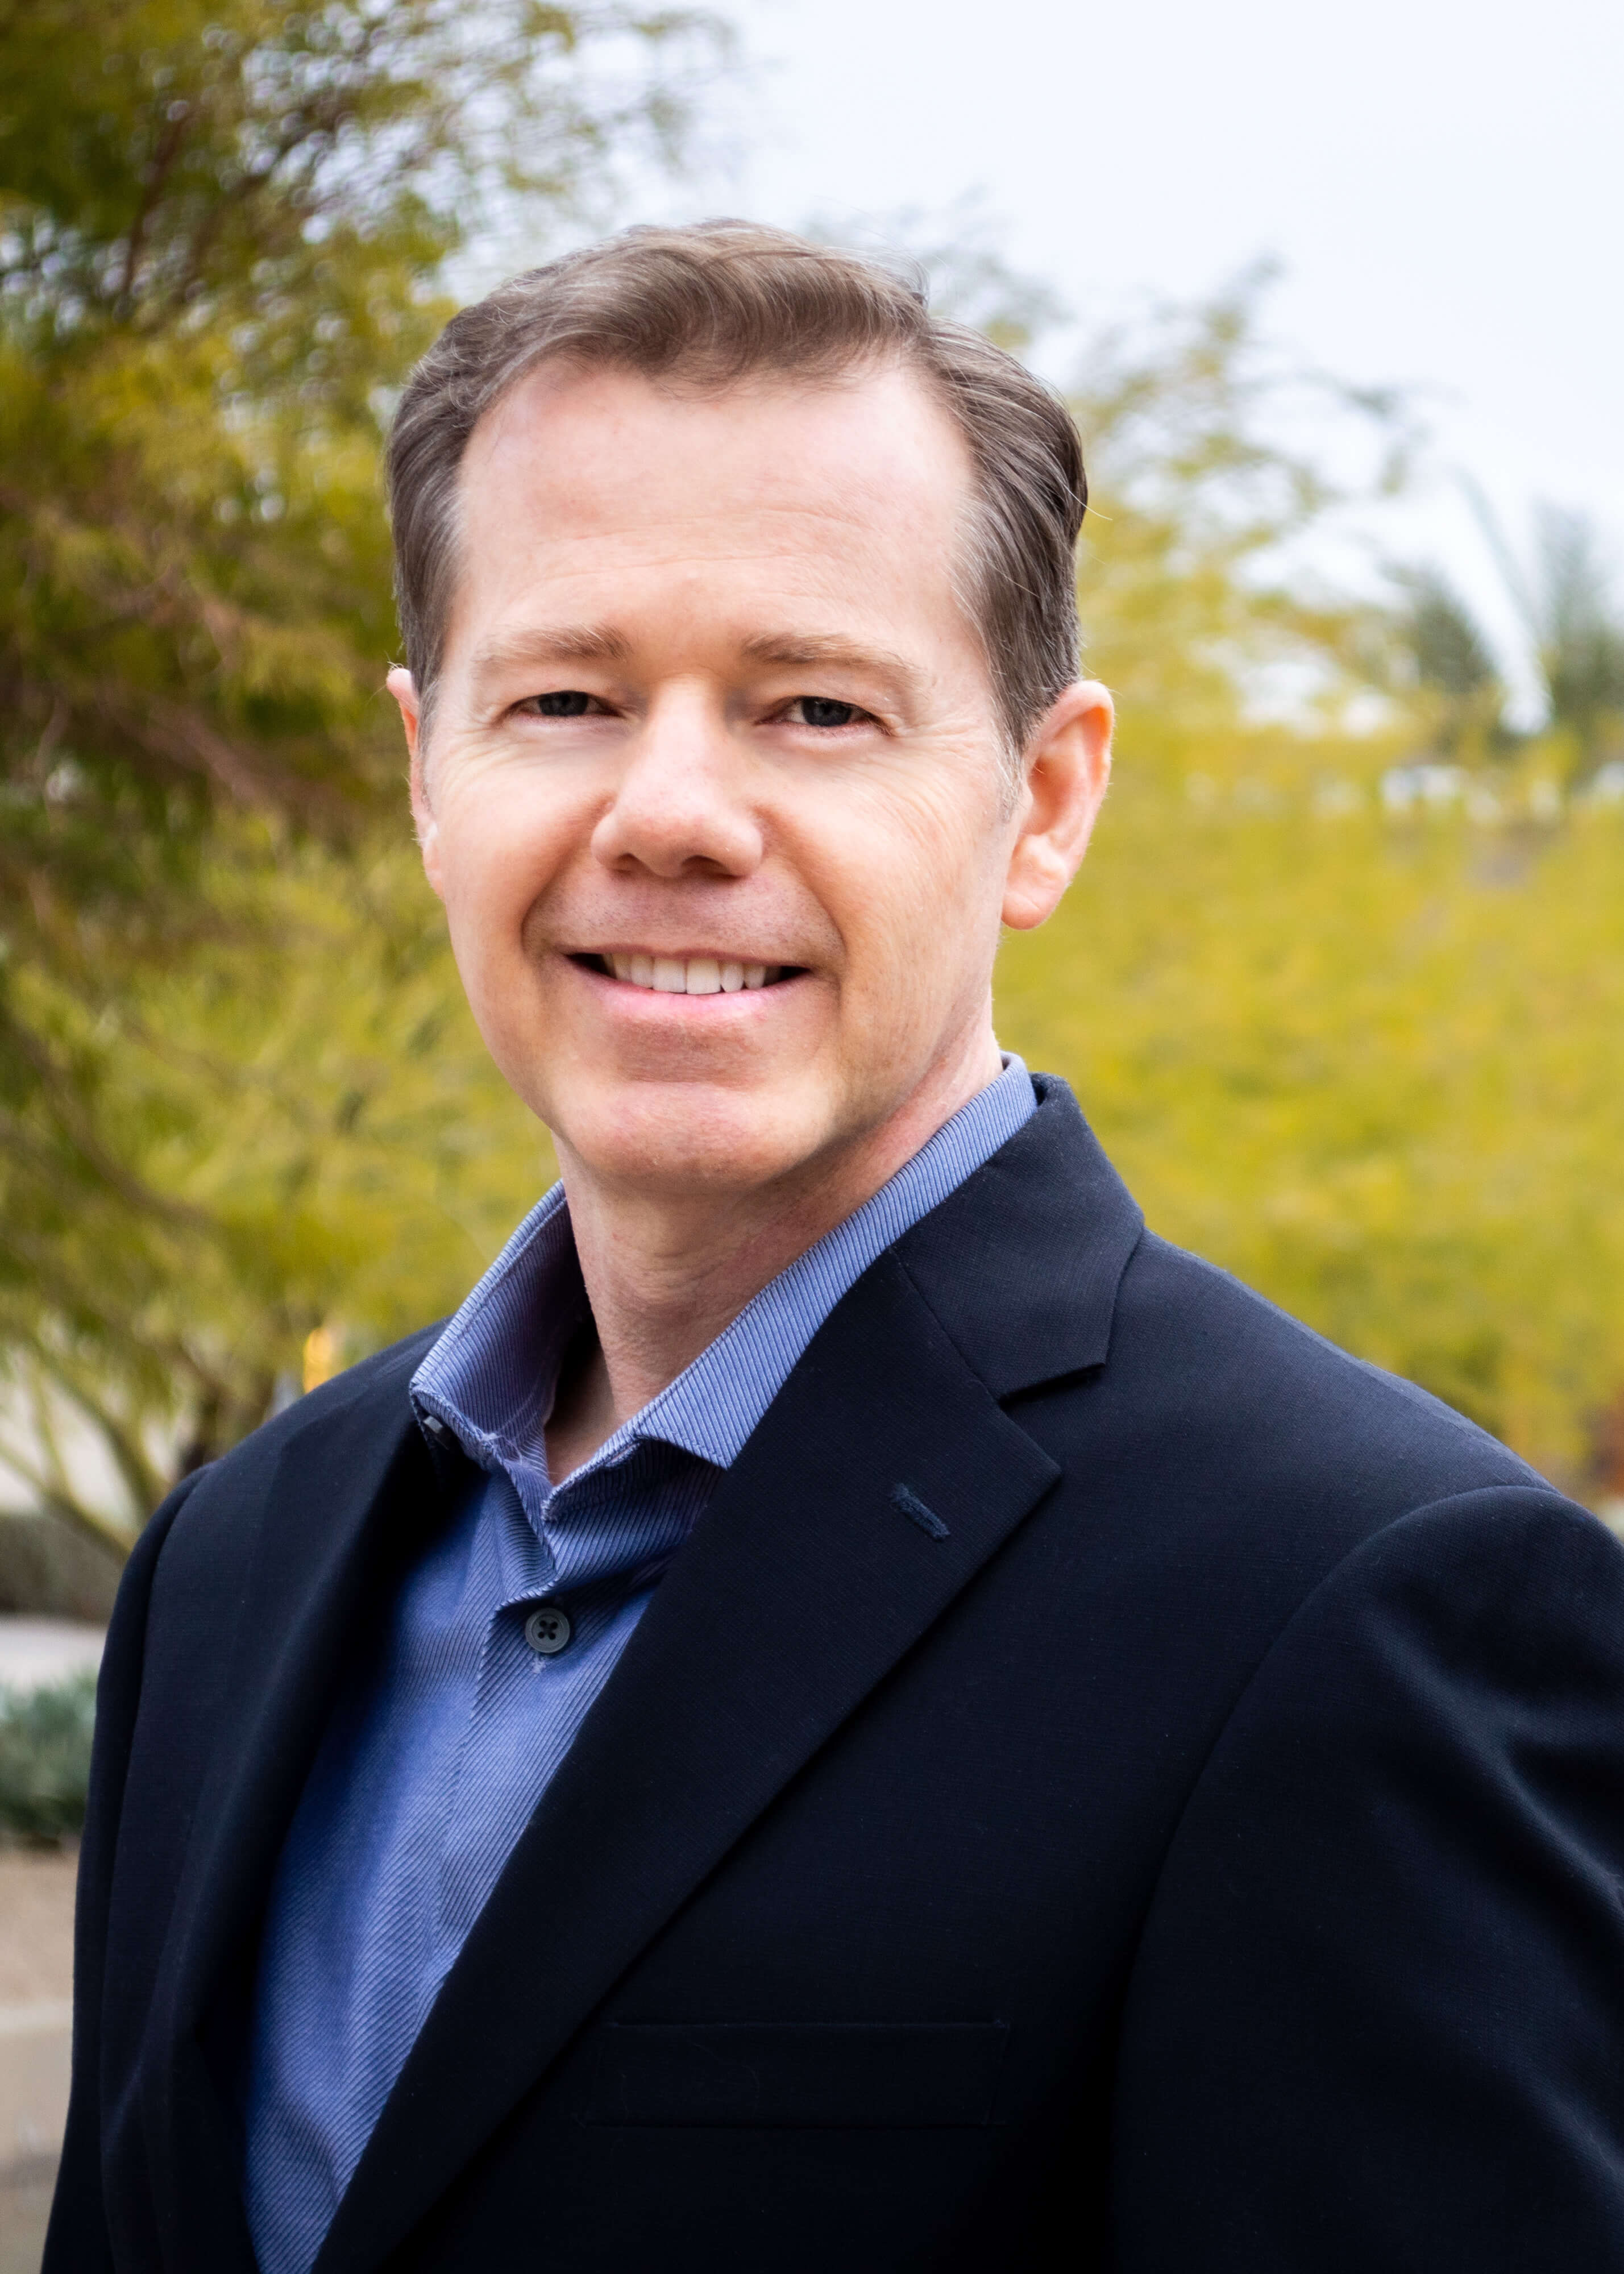 Justin Bevins Las Vegas Real Estate Listing Specialist